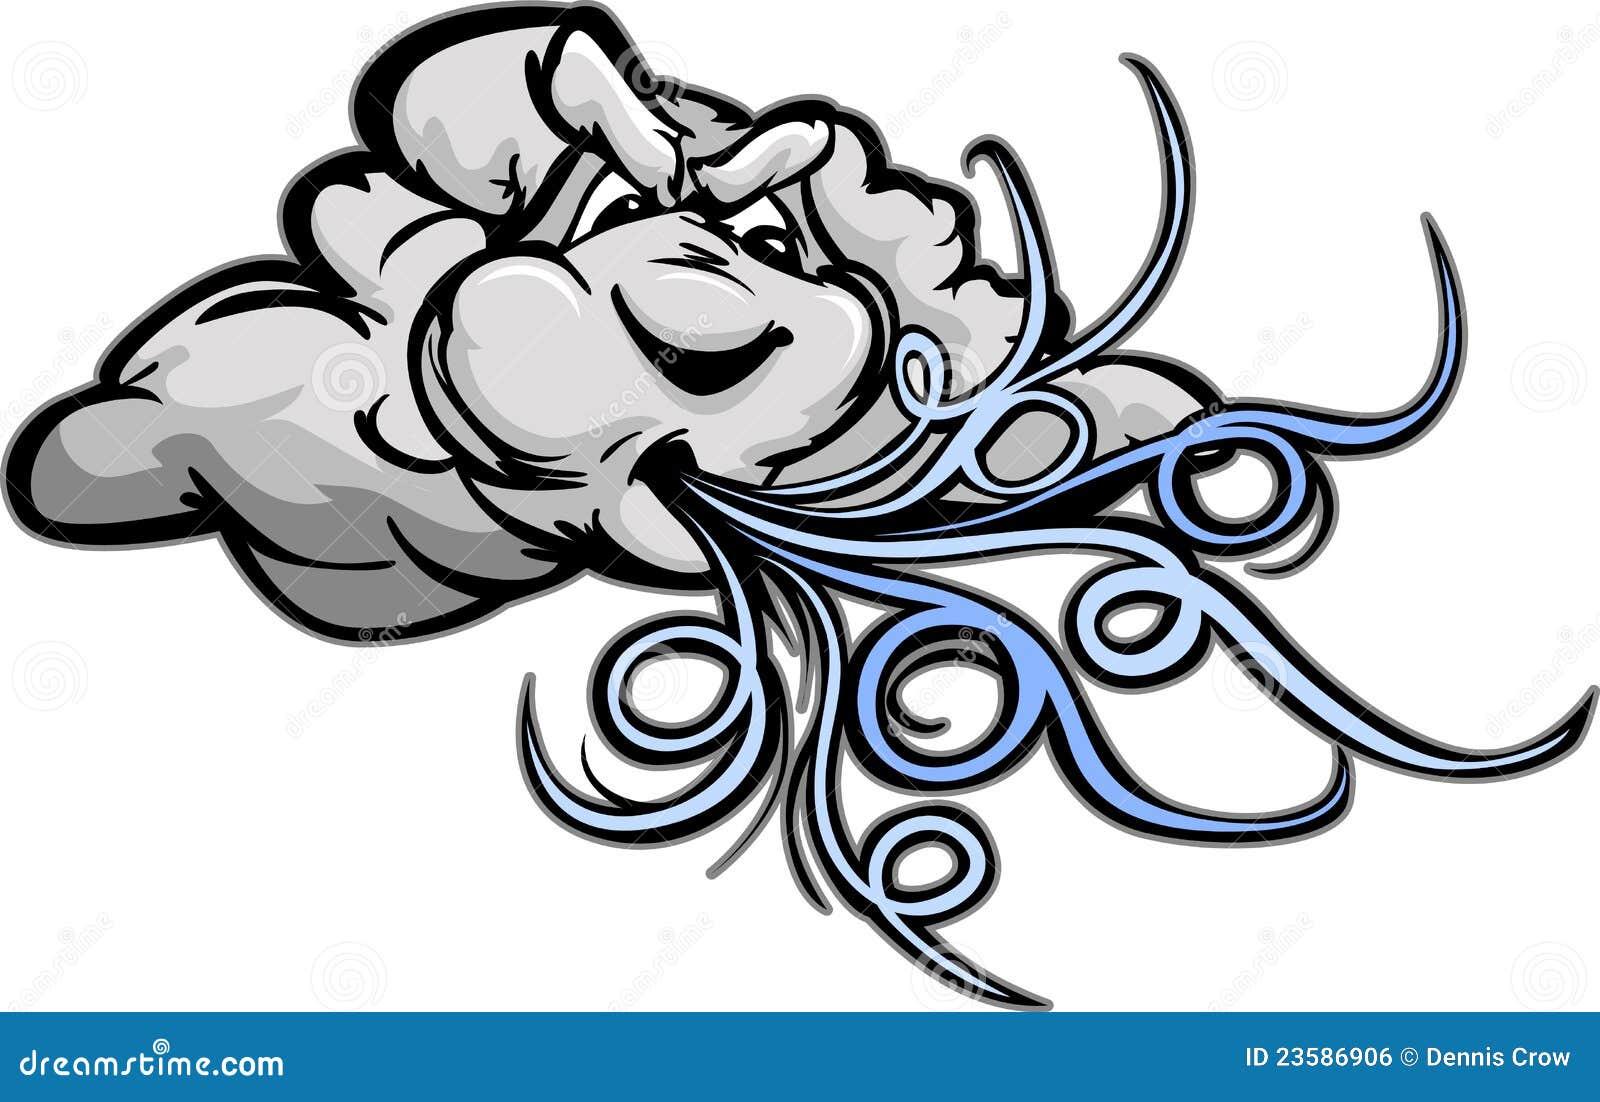 Cartoon Wind Swirls